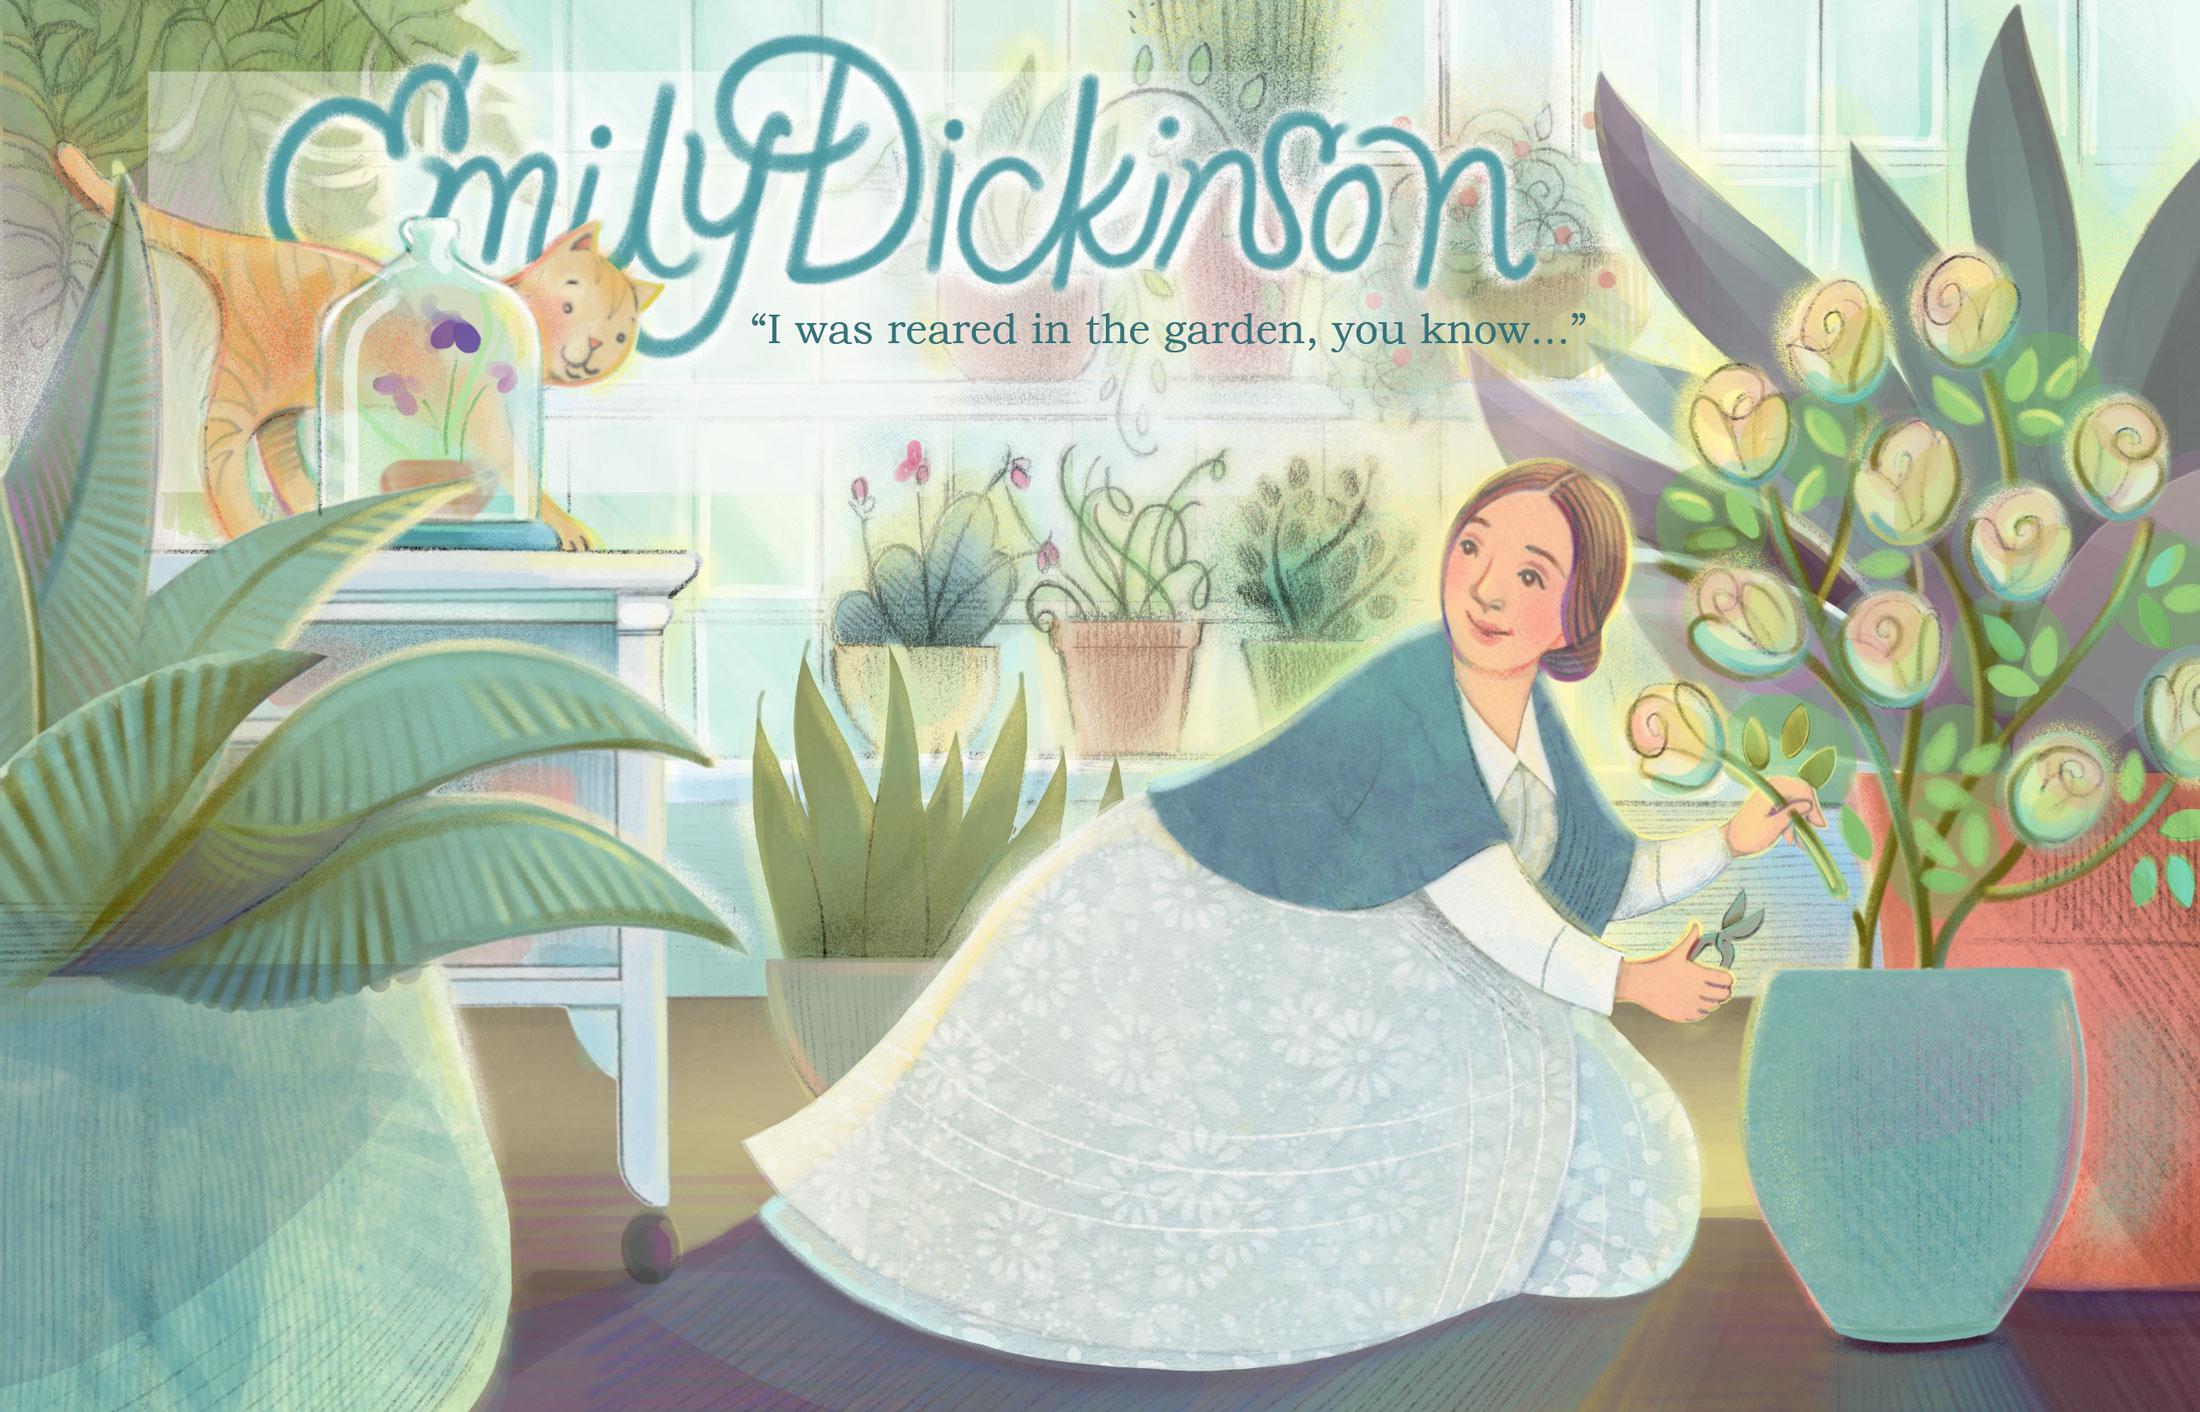 Emily-Dickinson-Front-Web-Portfolio-S-Murray-.jpg